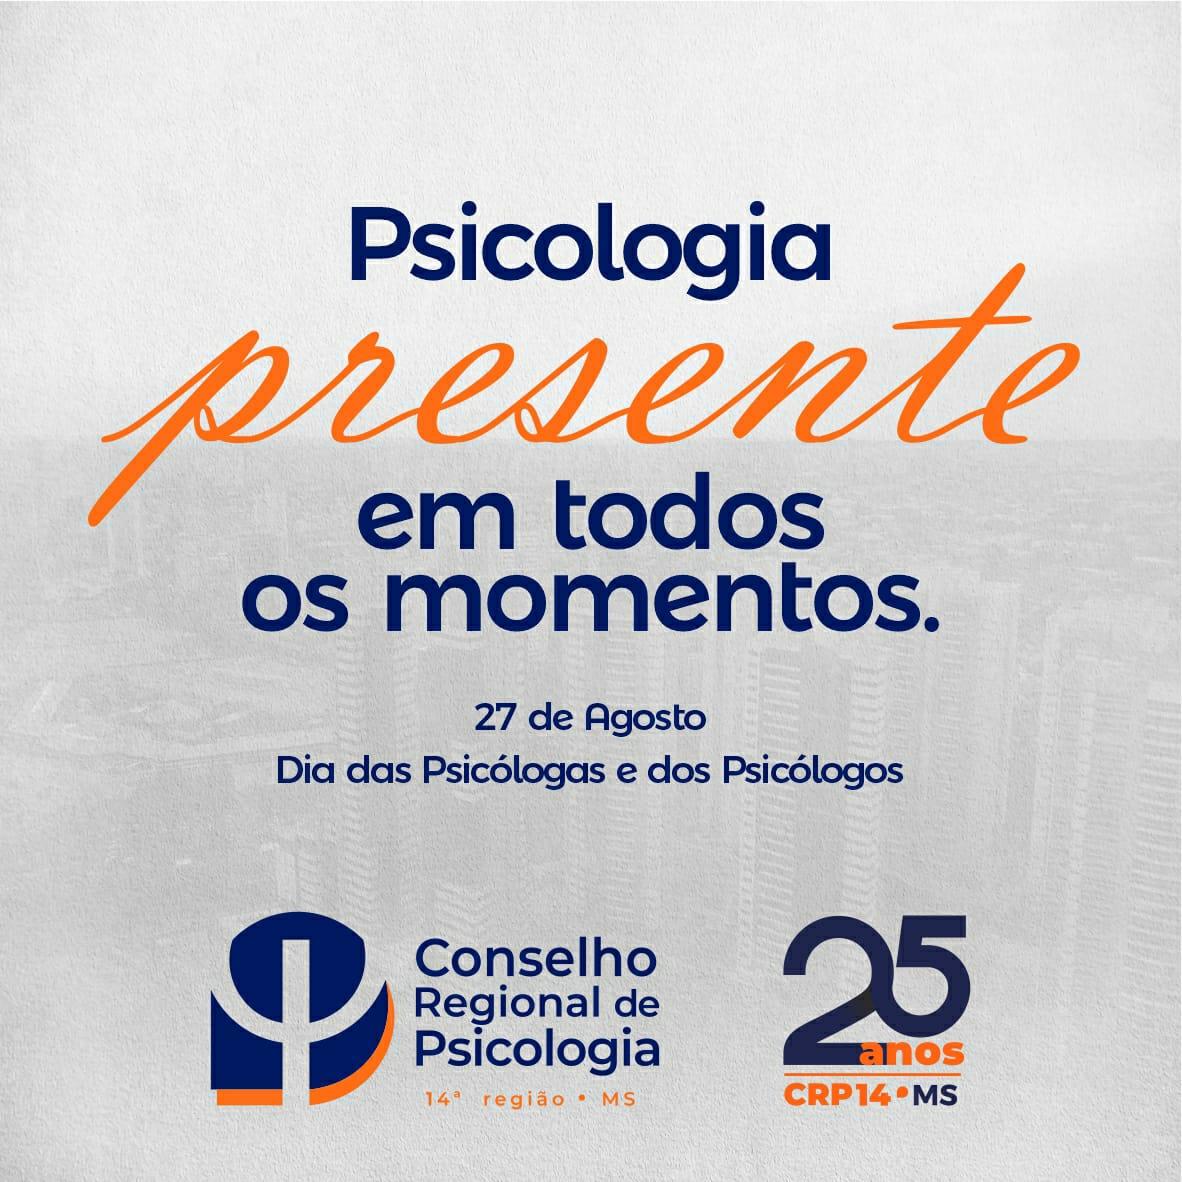 You are currently viewing Psicologia presente em todos os momentos.